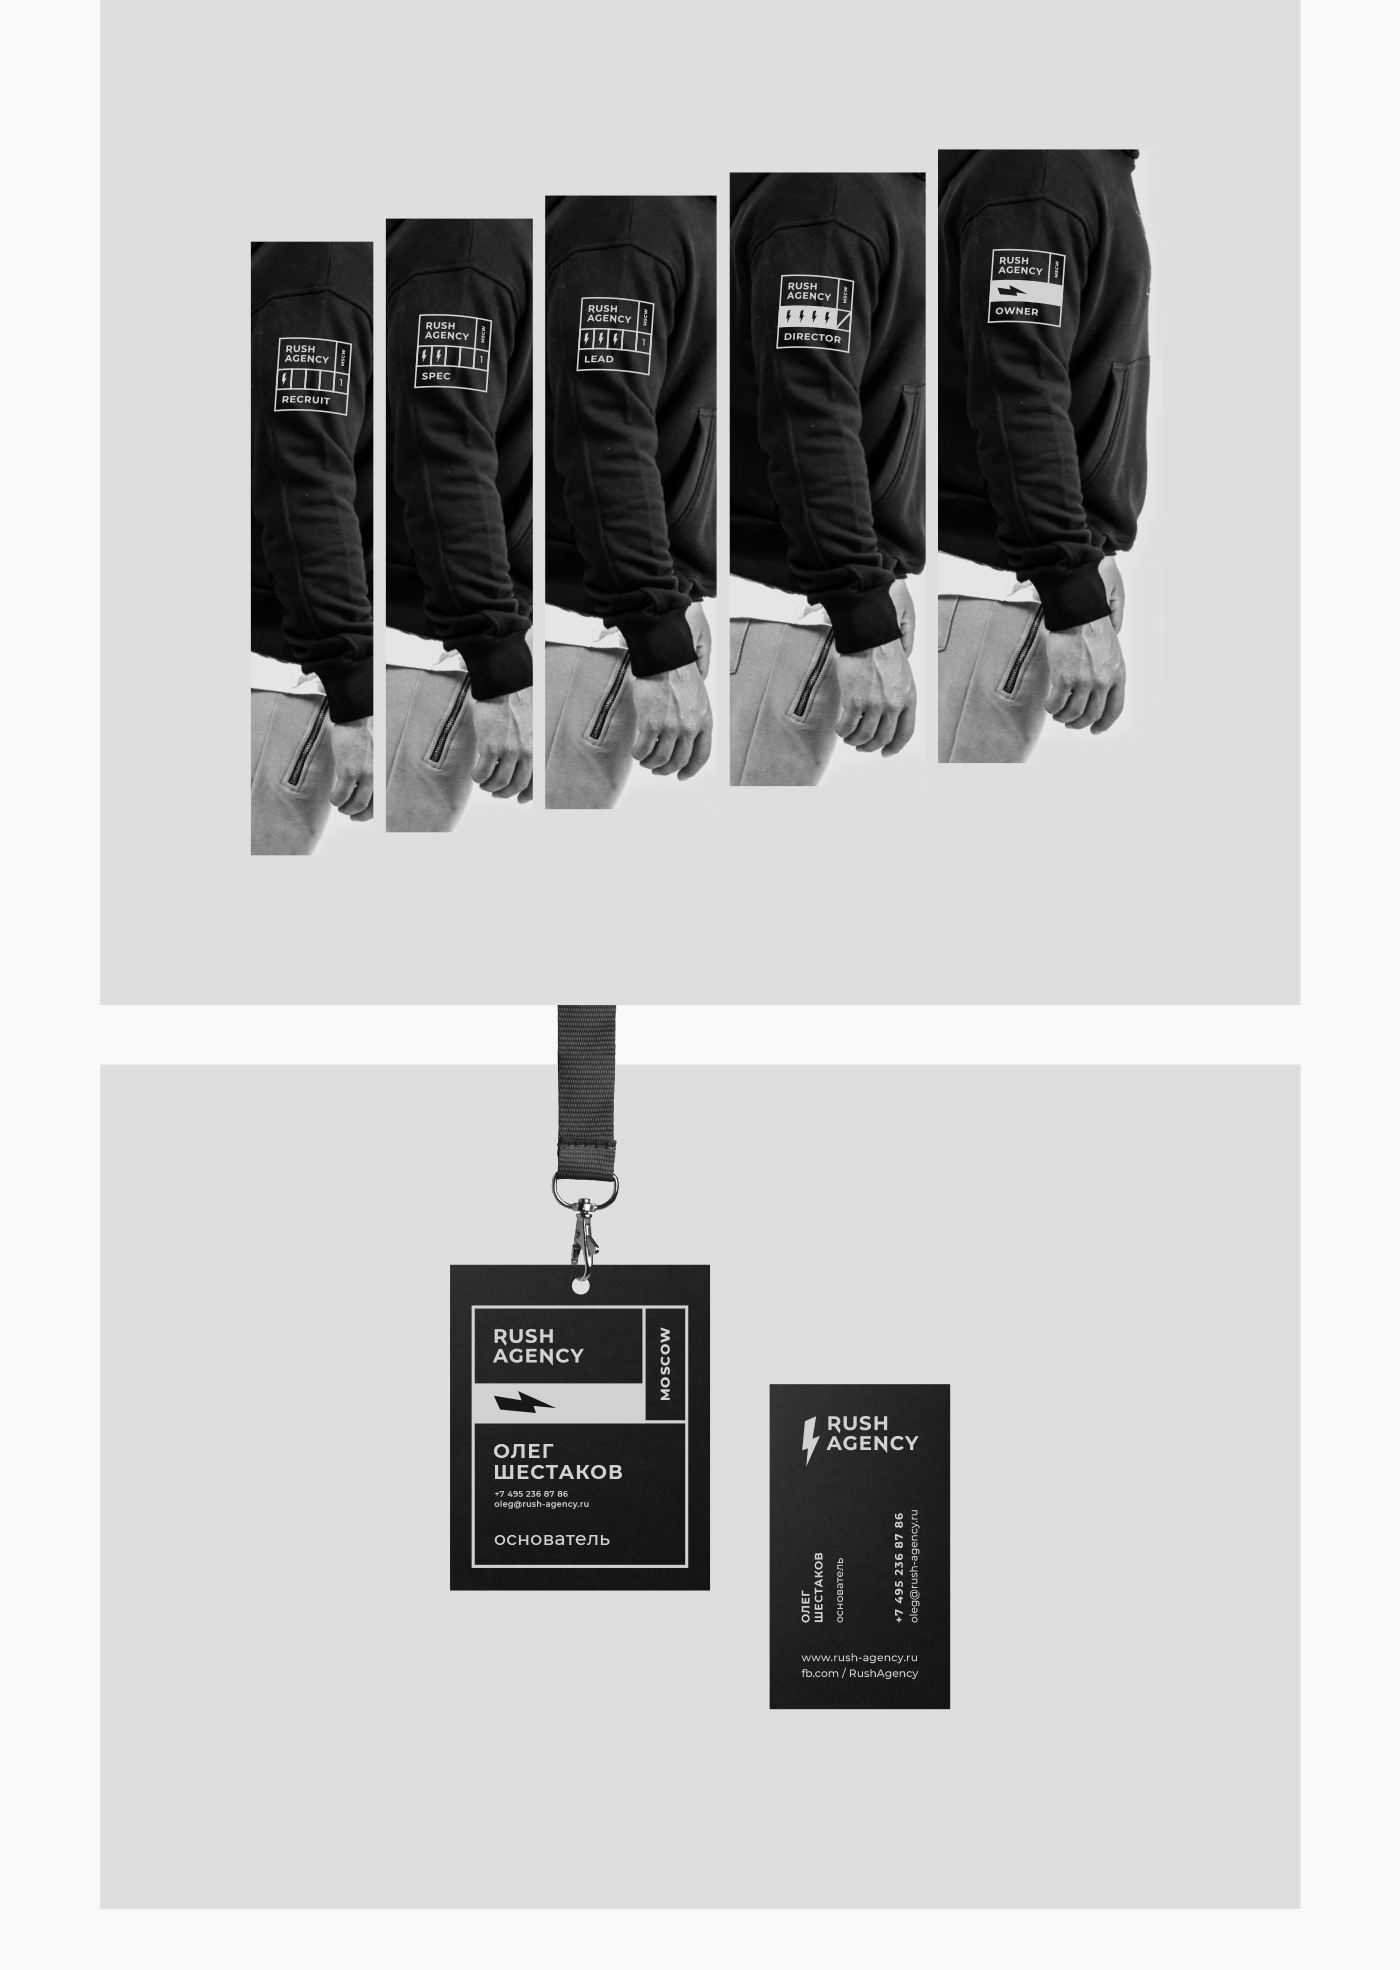 Minimalism clan digital mafia black black and white Flash branding  Corporate Identity identity